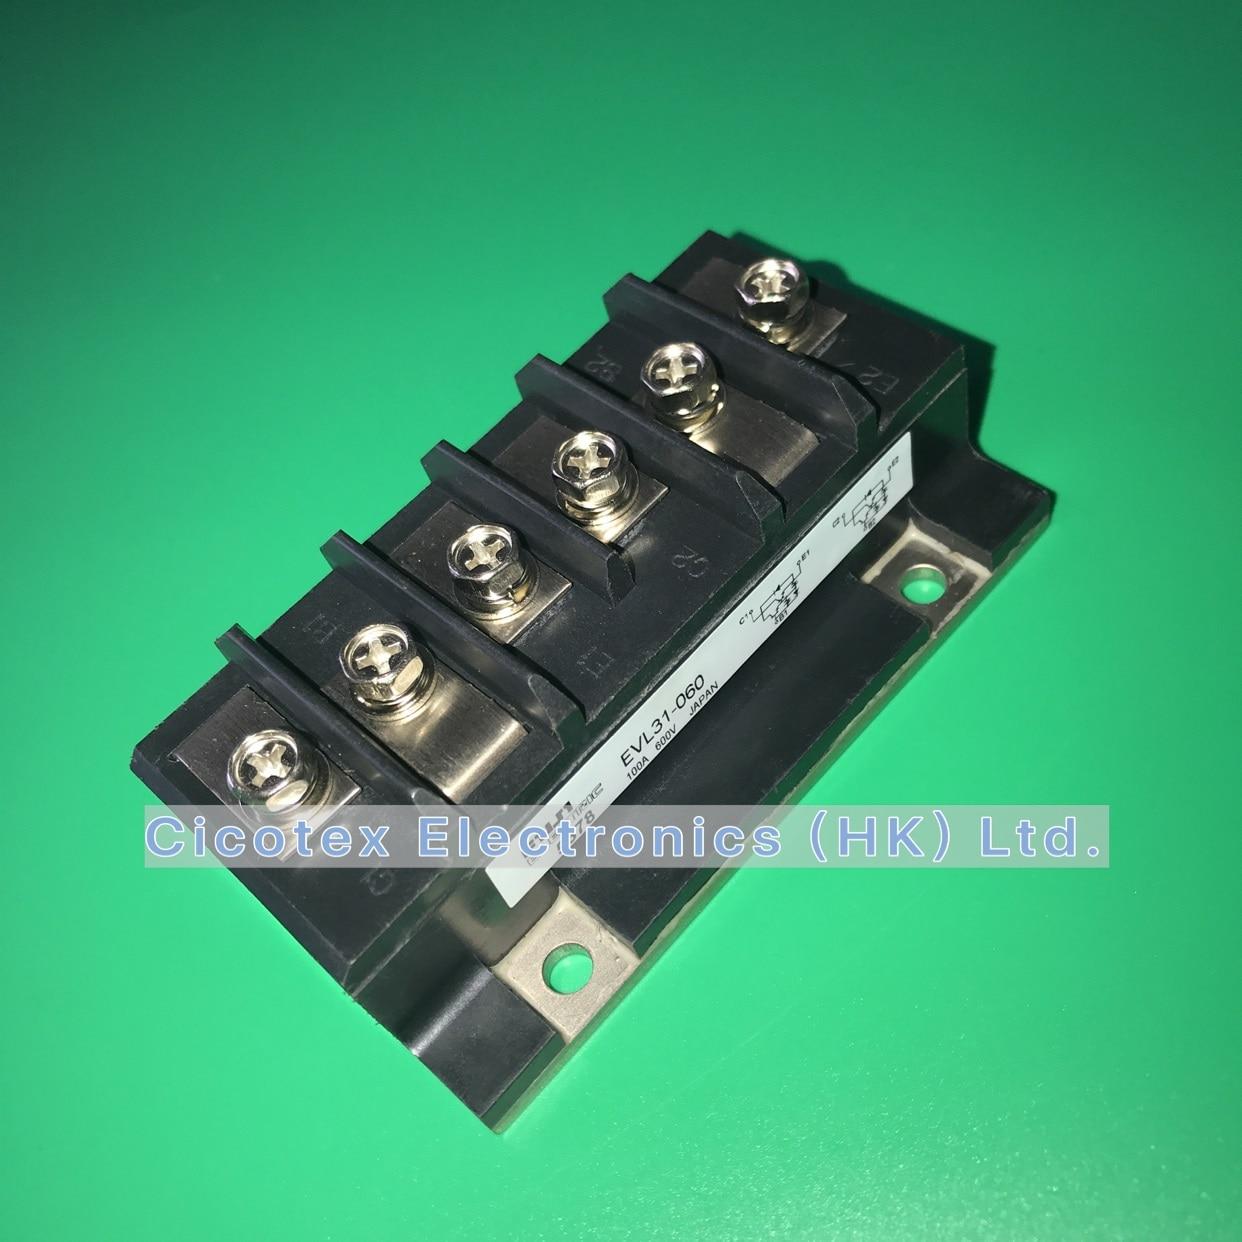 EVL31-060 وحدة IGBT 100A 600V القطبين الترانزستور وحدات تصنيف والمواصفات EVL31060